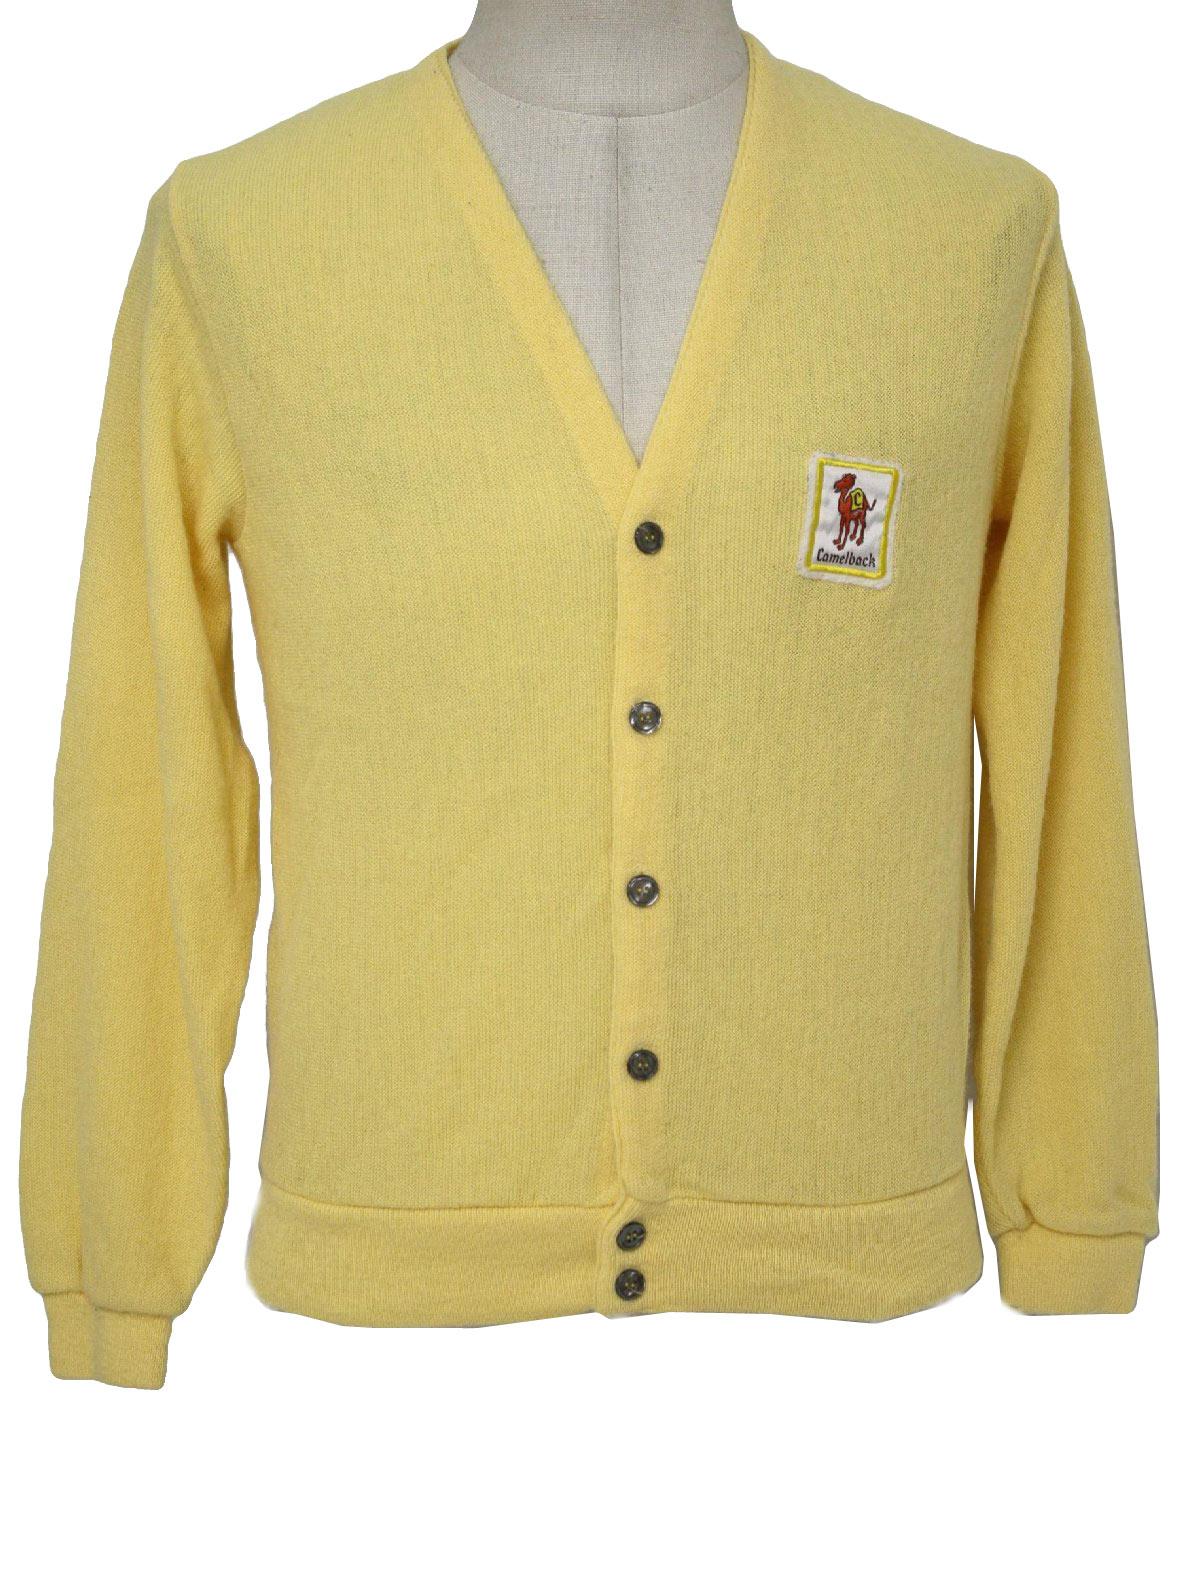 Retro 70s Caridgan Sweater (Scottsdale) : 70s -Scottsdale- Mens ...